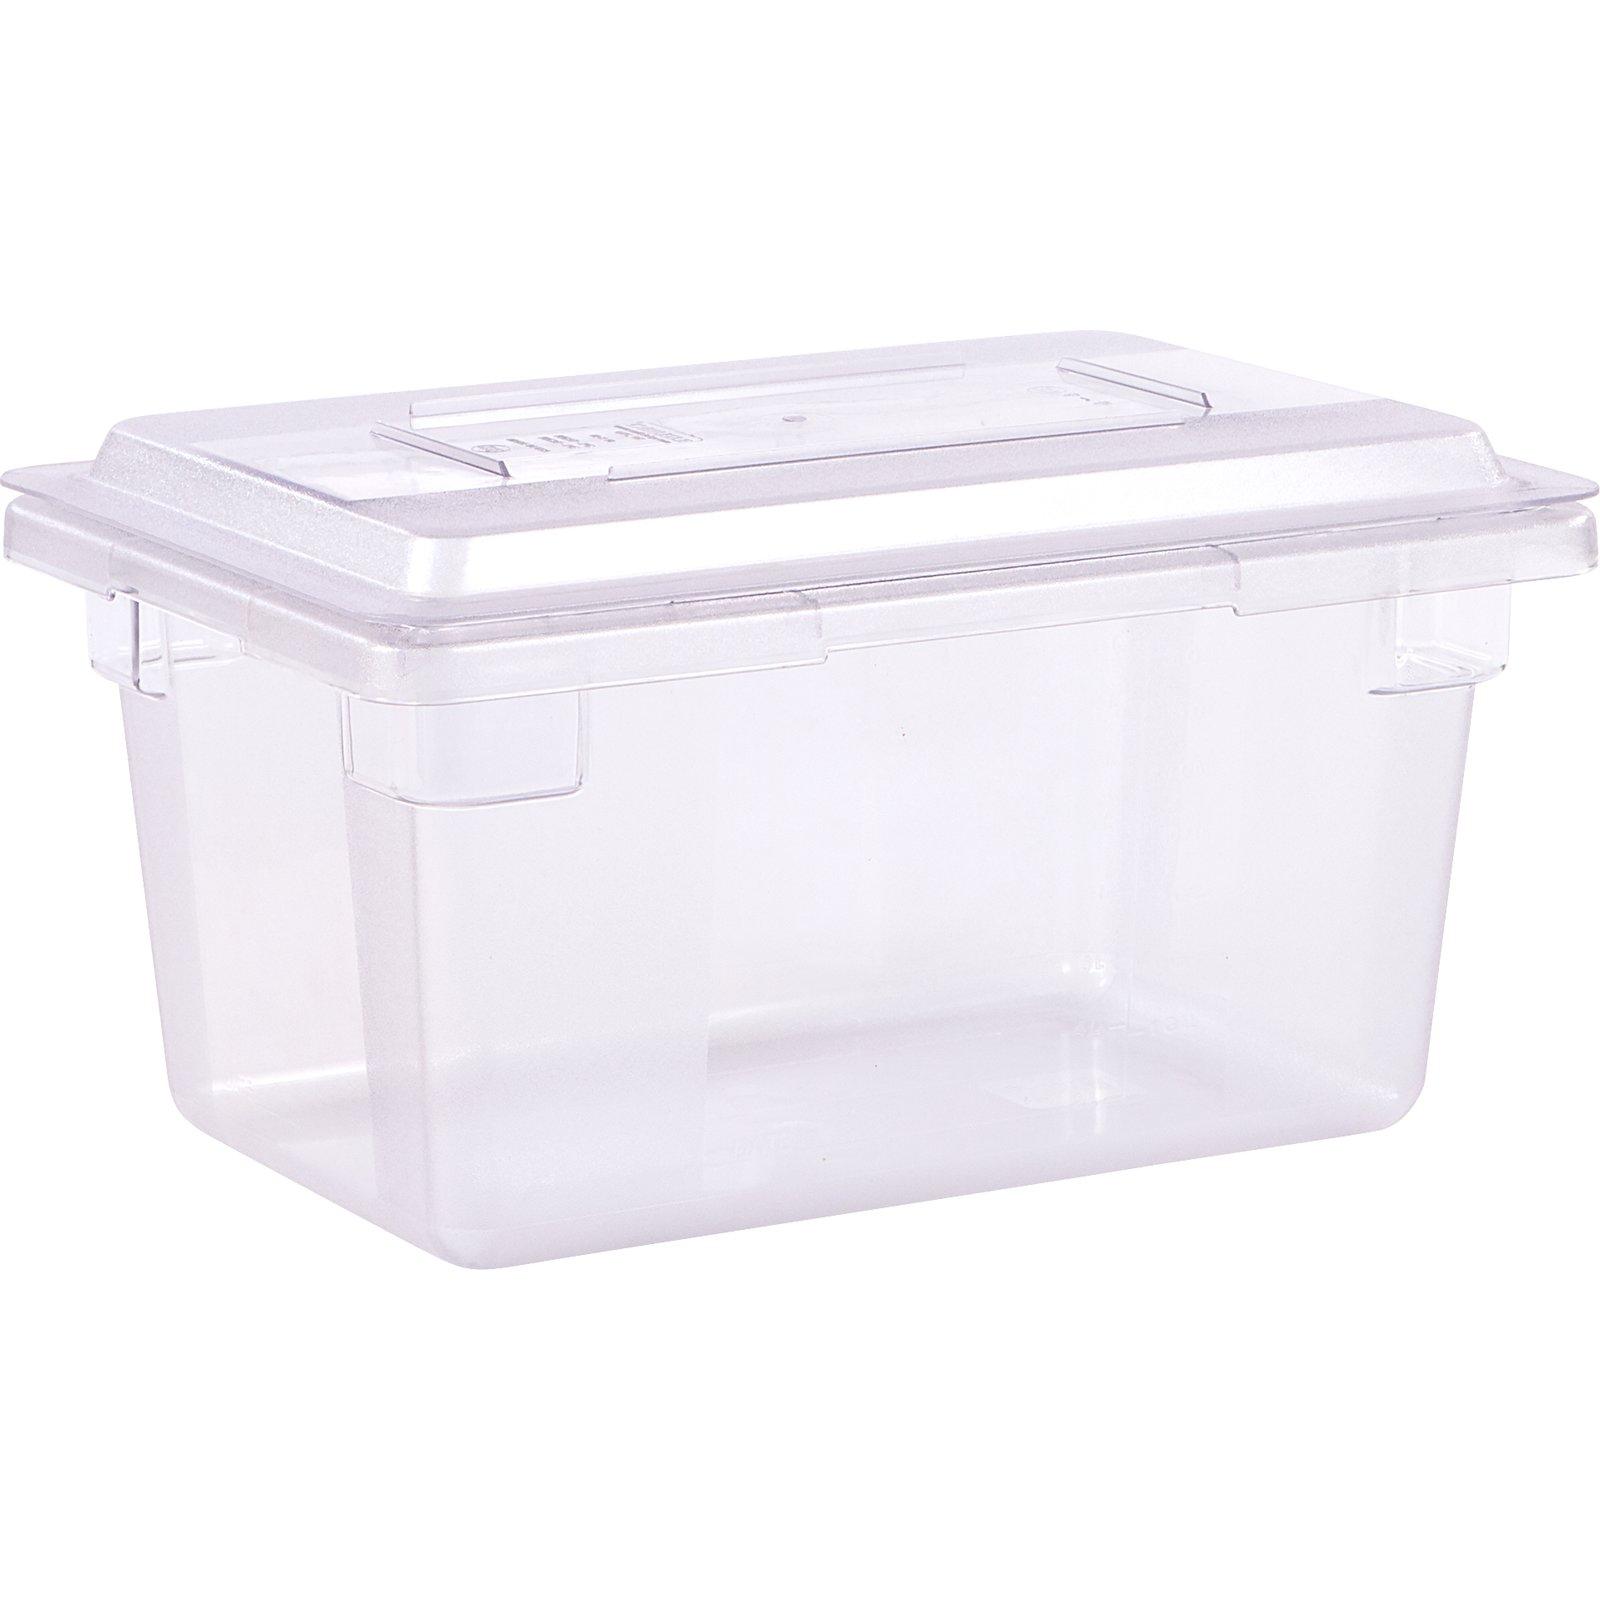 1061207 StorPlus Polycarbonate Food Box Storage Container 5